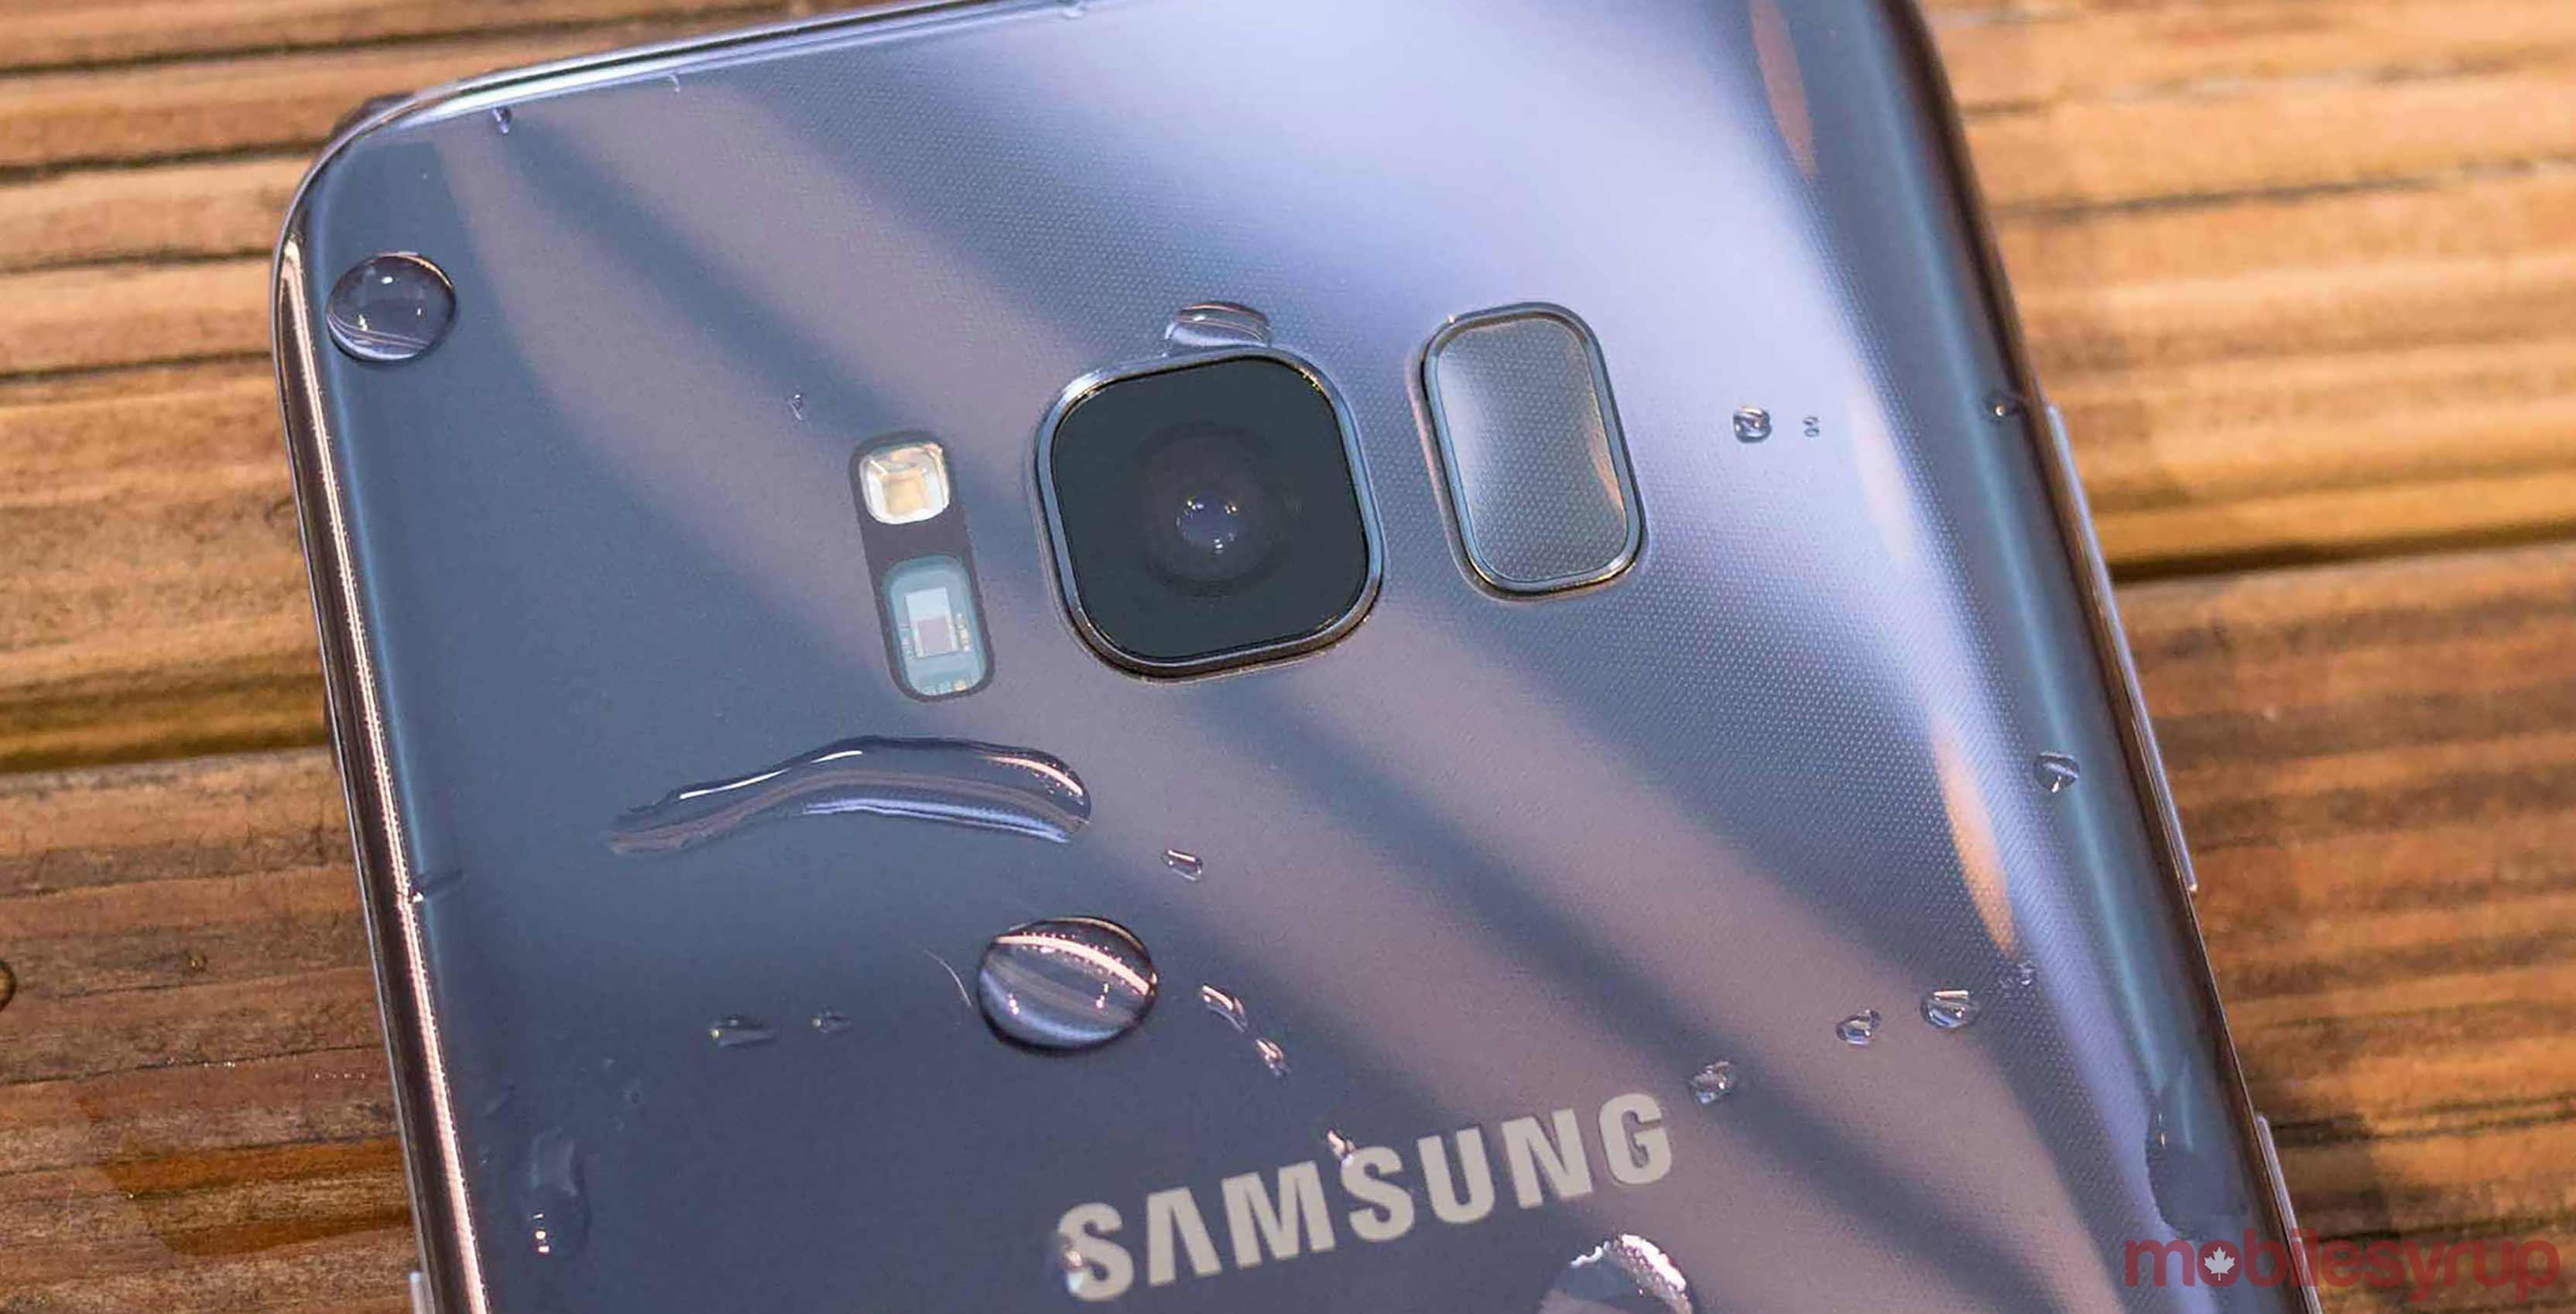 samsung galaxy s8 camera and fingerprint sensor